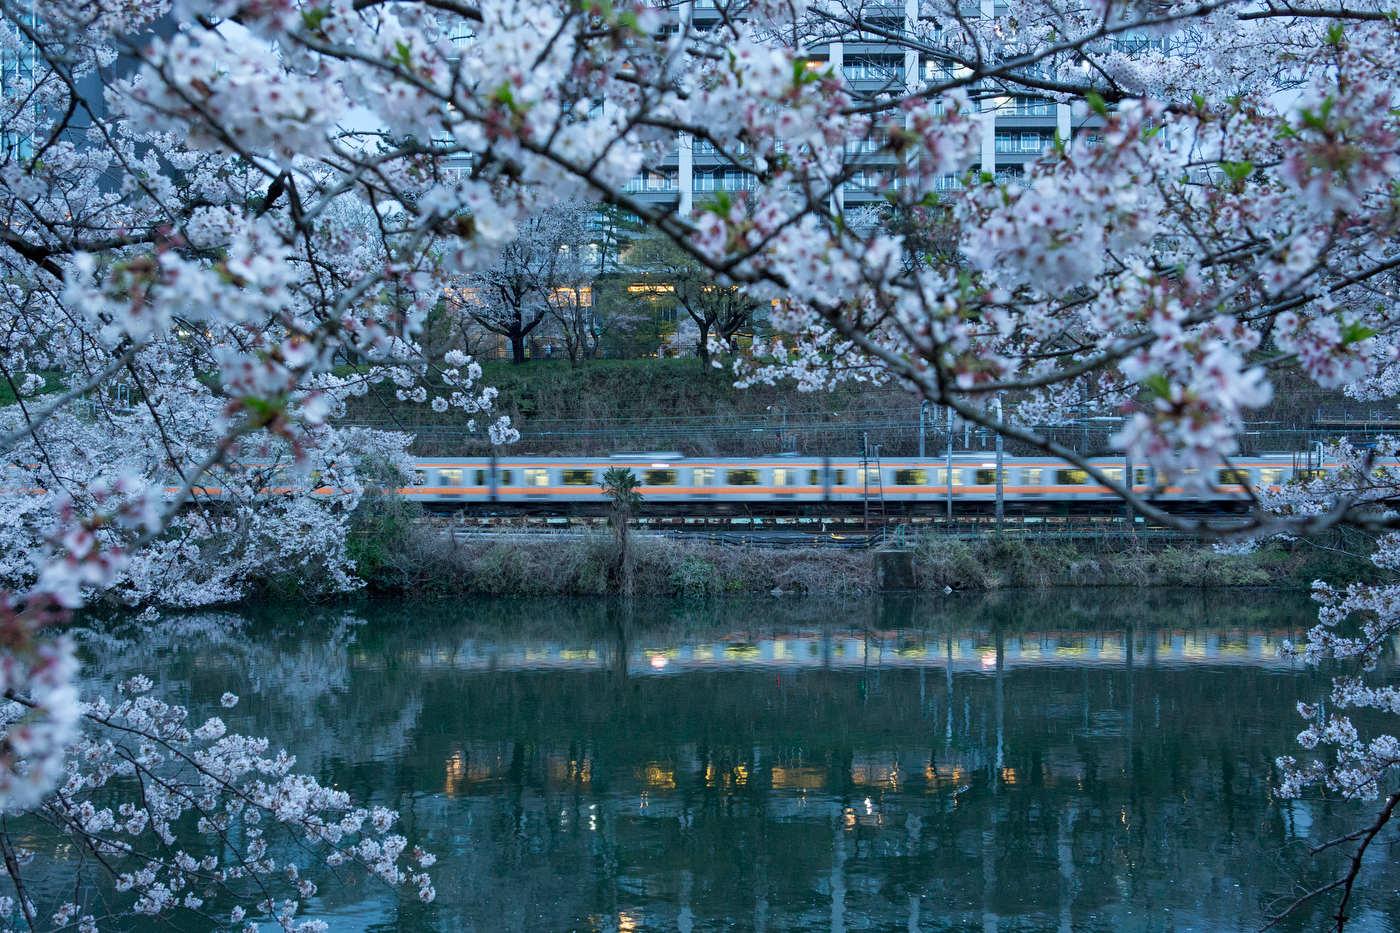 Cherry blossom and train alongside the Kandagawa River, Kagurazaka.